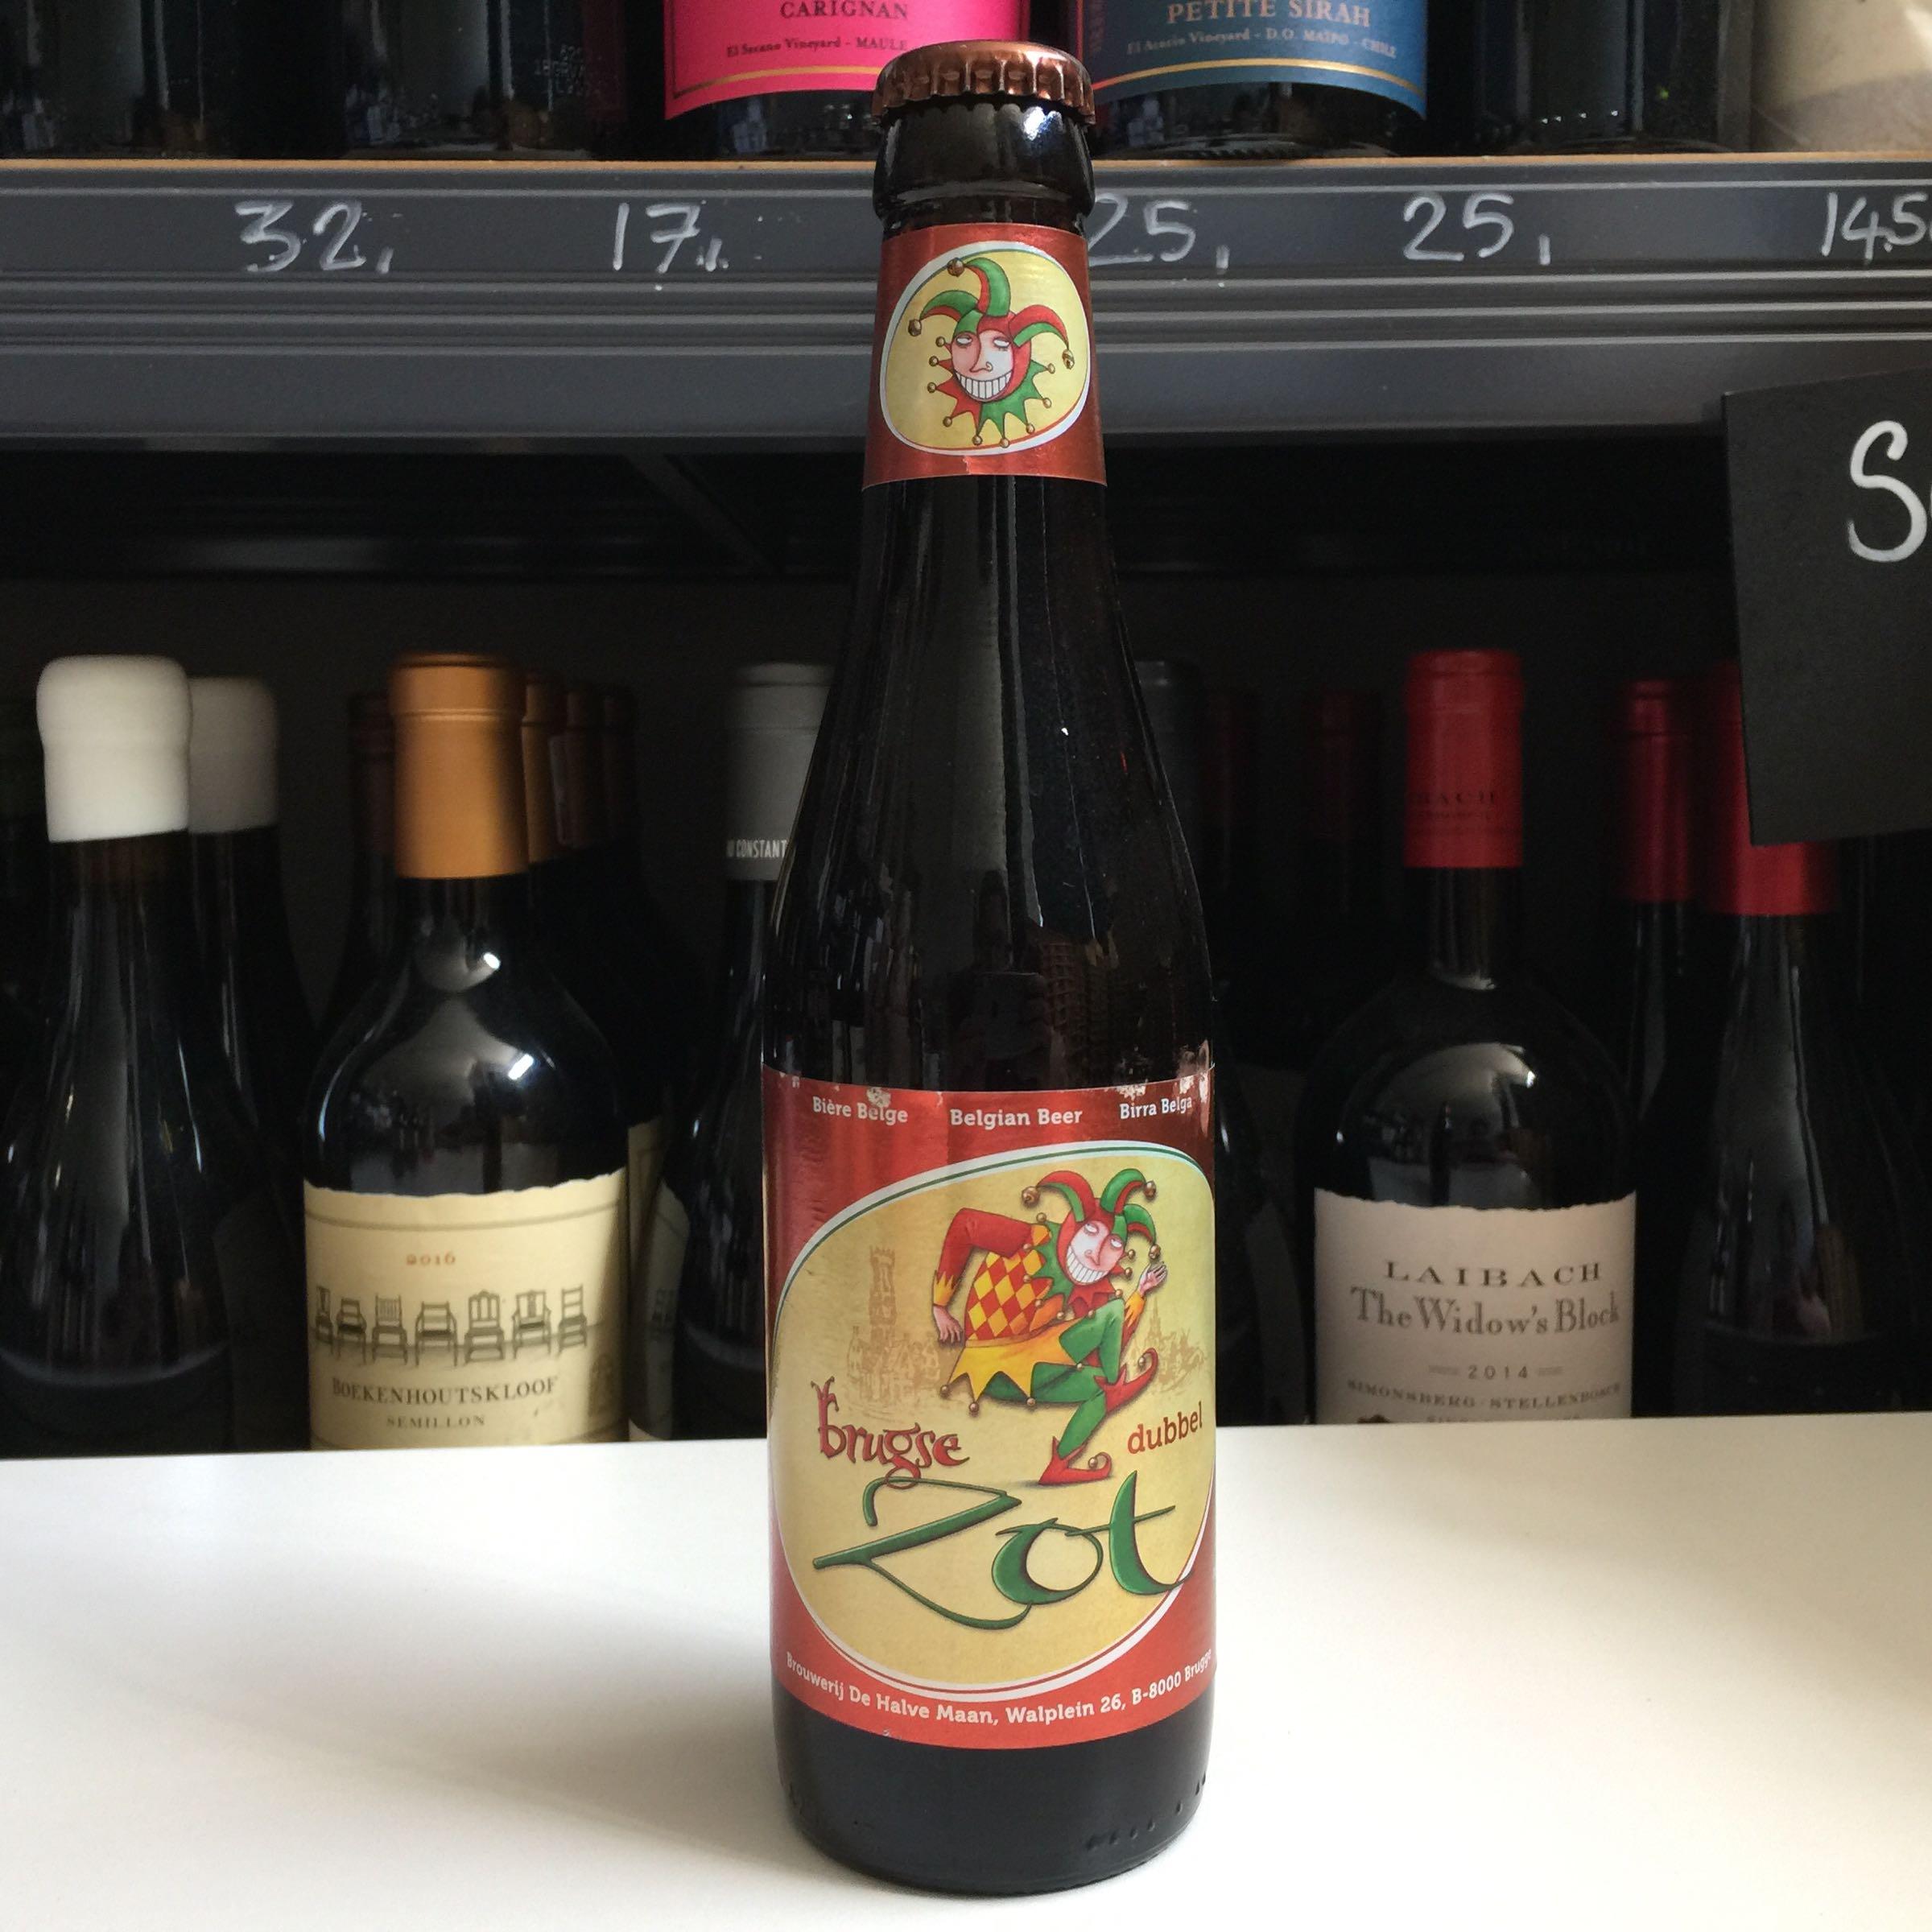 Brugse Zot Brune 'Strong Brown Belgium Beer' 33cl 7.5% ABV